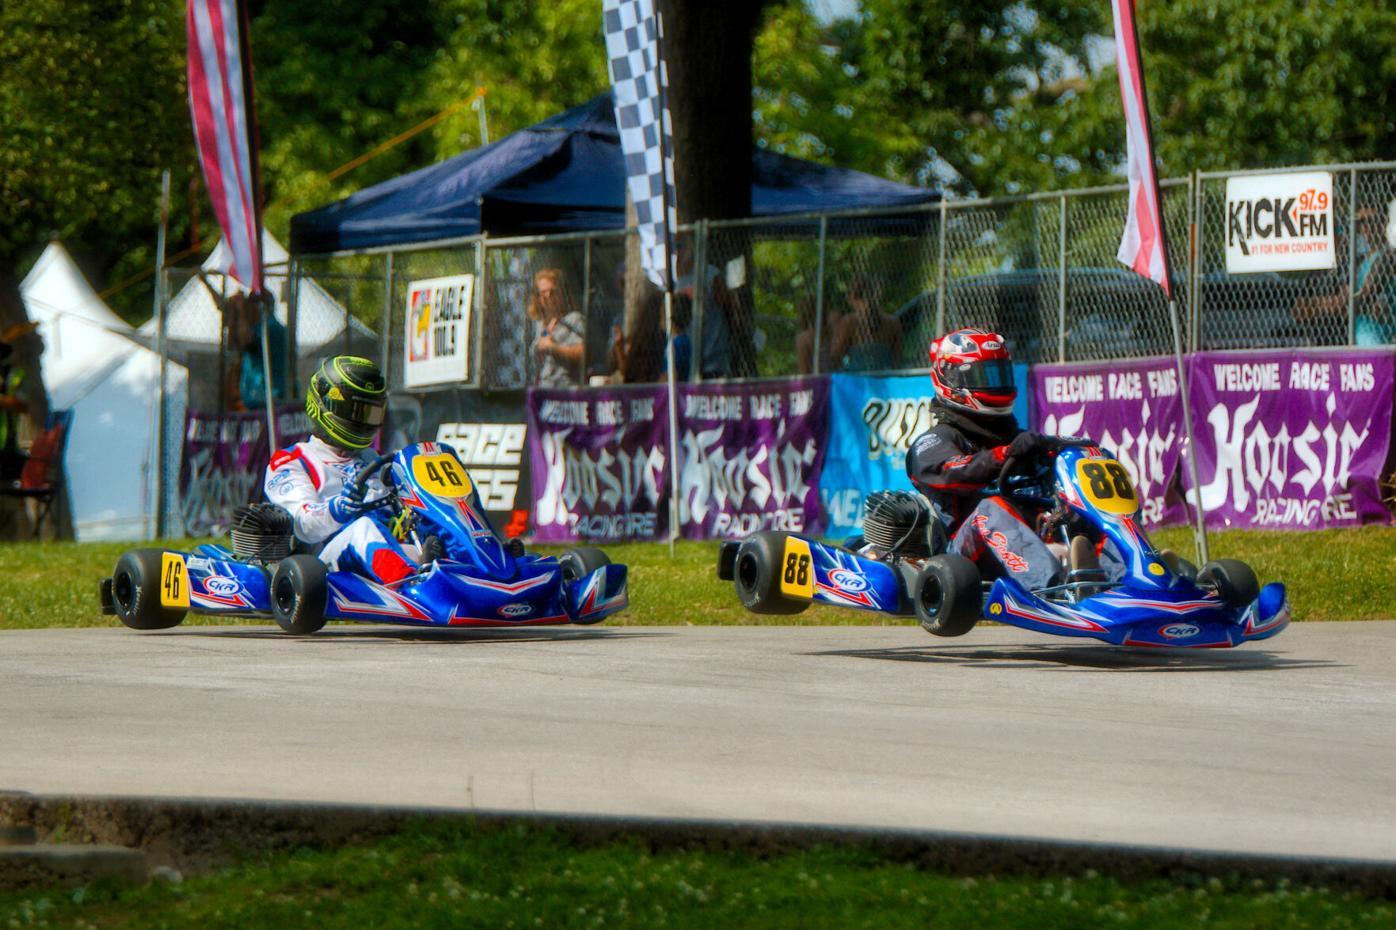 Grand Prix of Karting